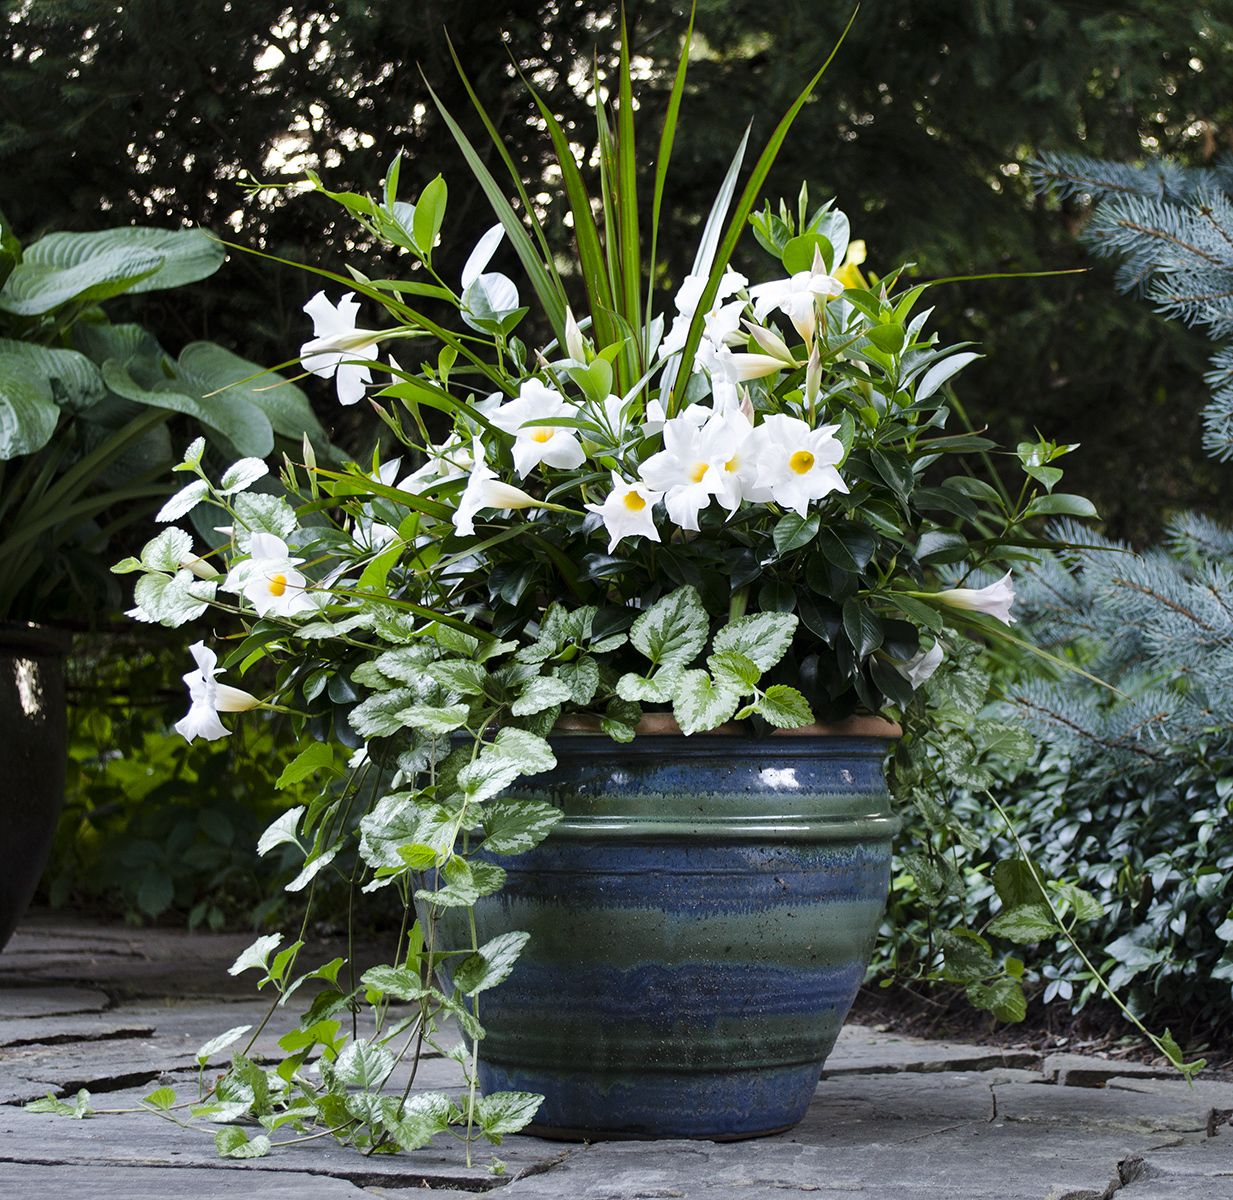 Outdoors And Gardening: Create A Midnight Garden With White Rio Dipladenias